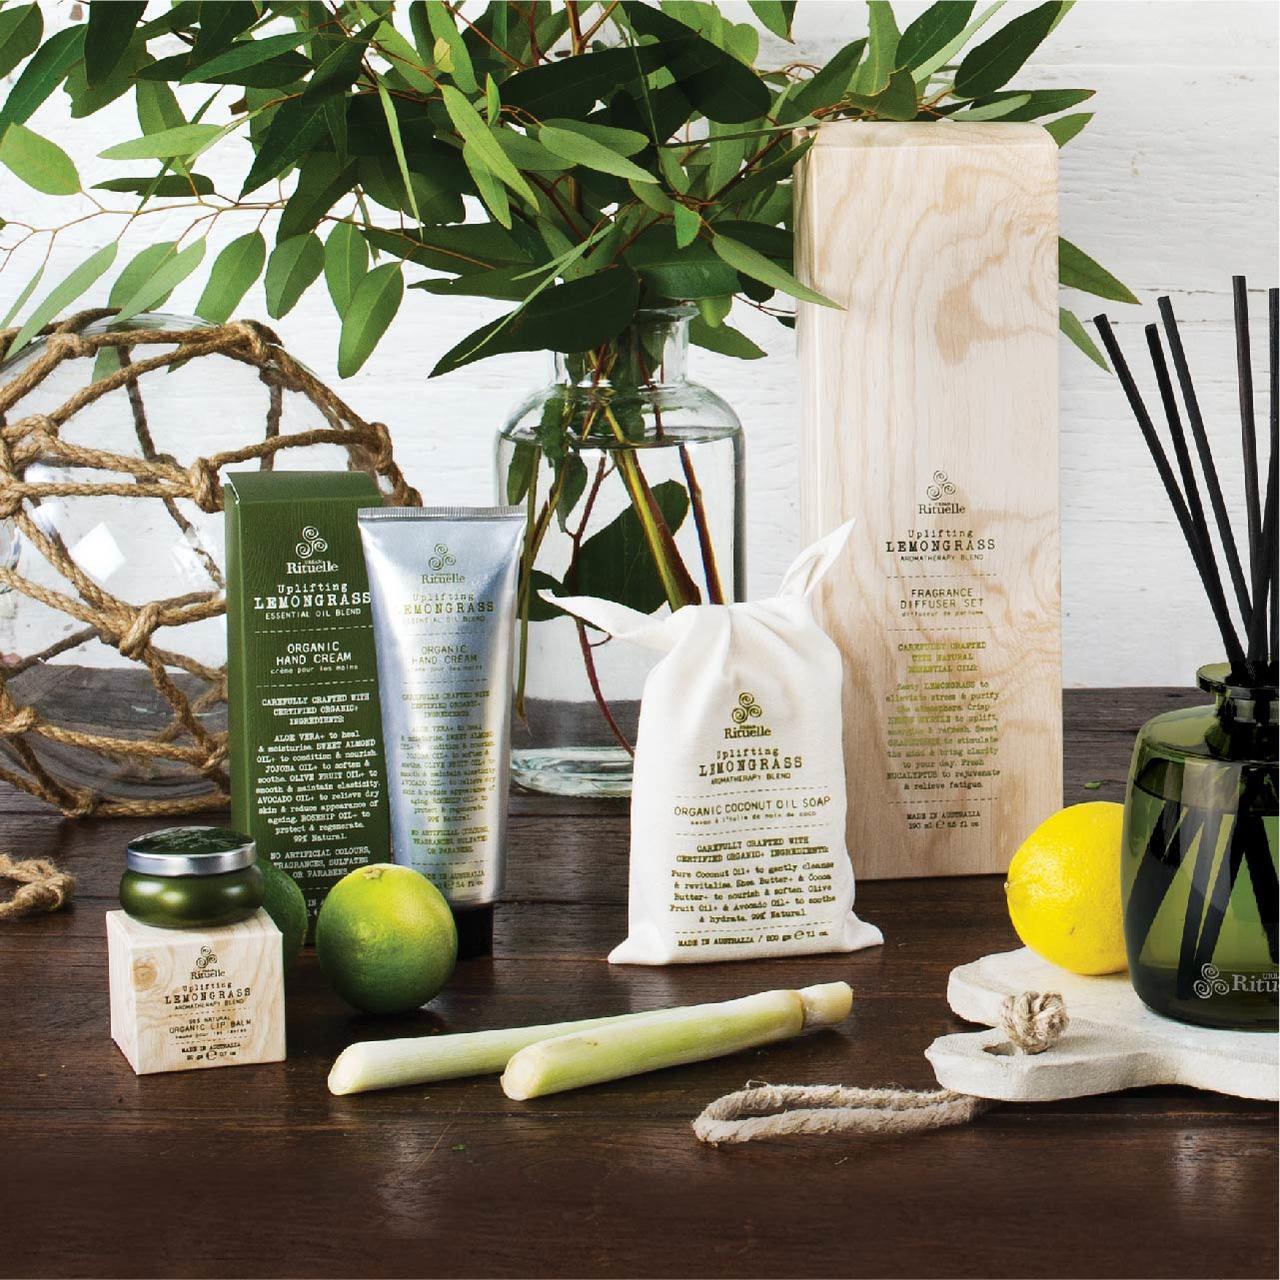 Flourish Organics - Organic Hand Cream - Lemongrass - Urban Rituelle